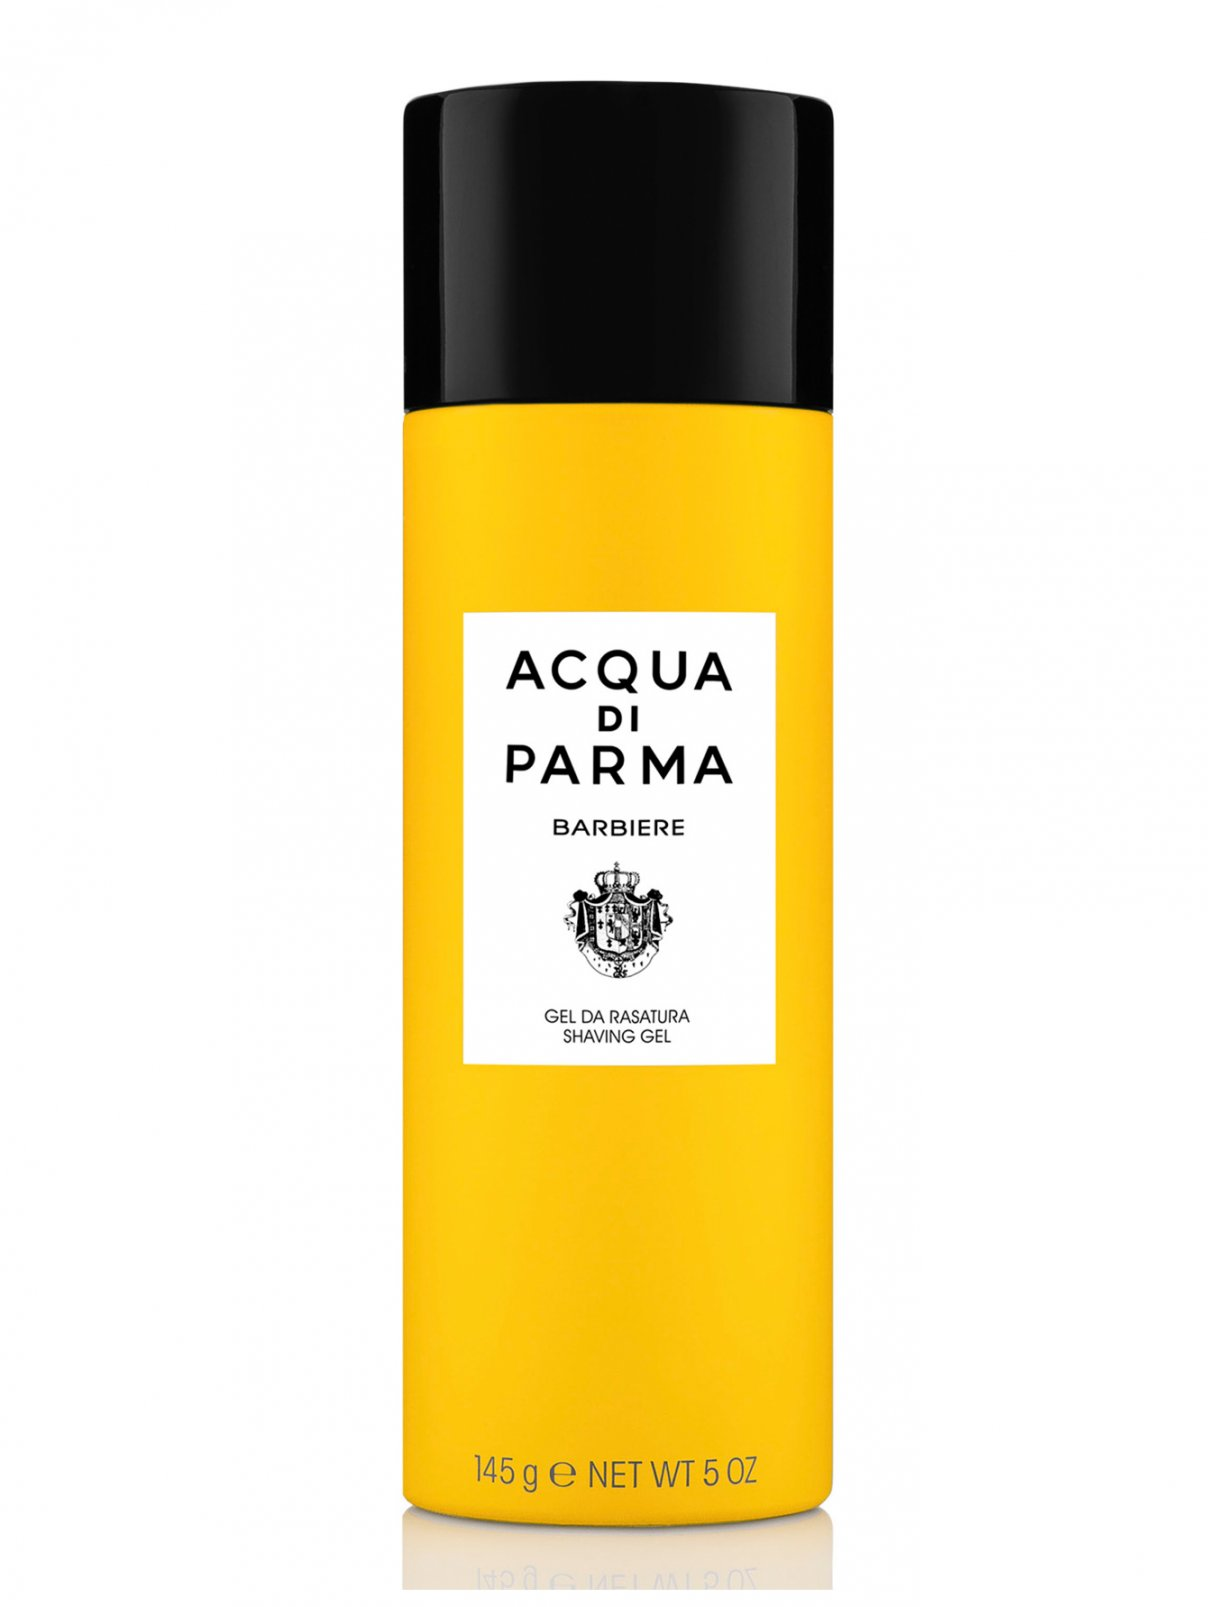 Гель для бритья 145 мл Barbiere Acqua di Parma  –  Общий вид